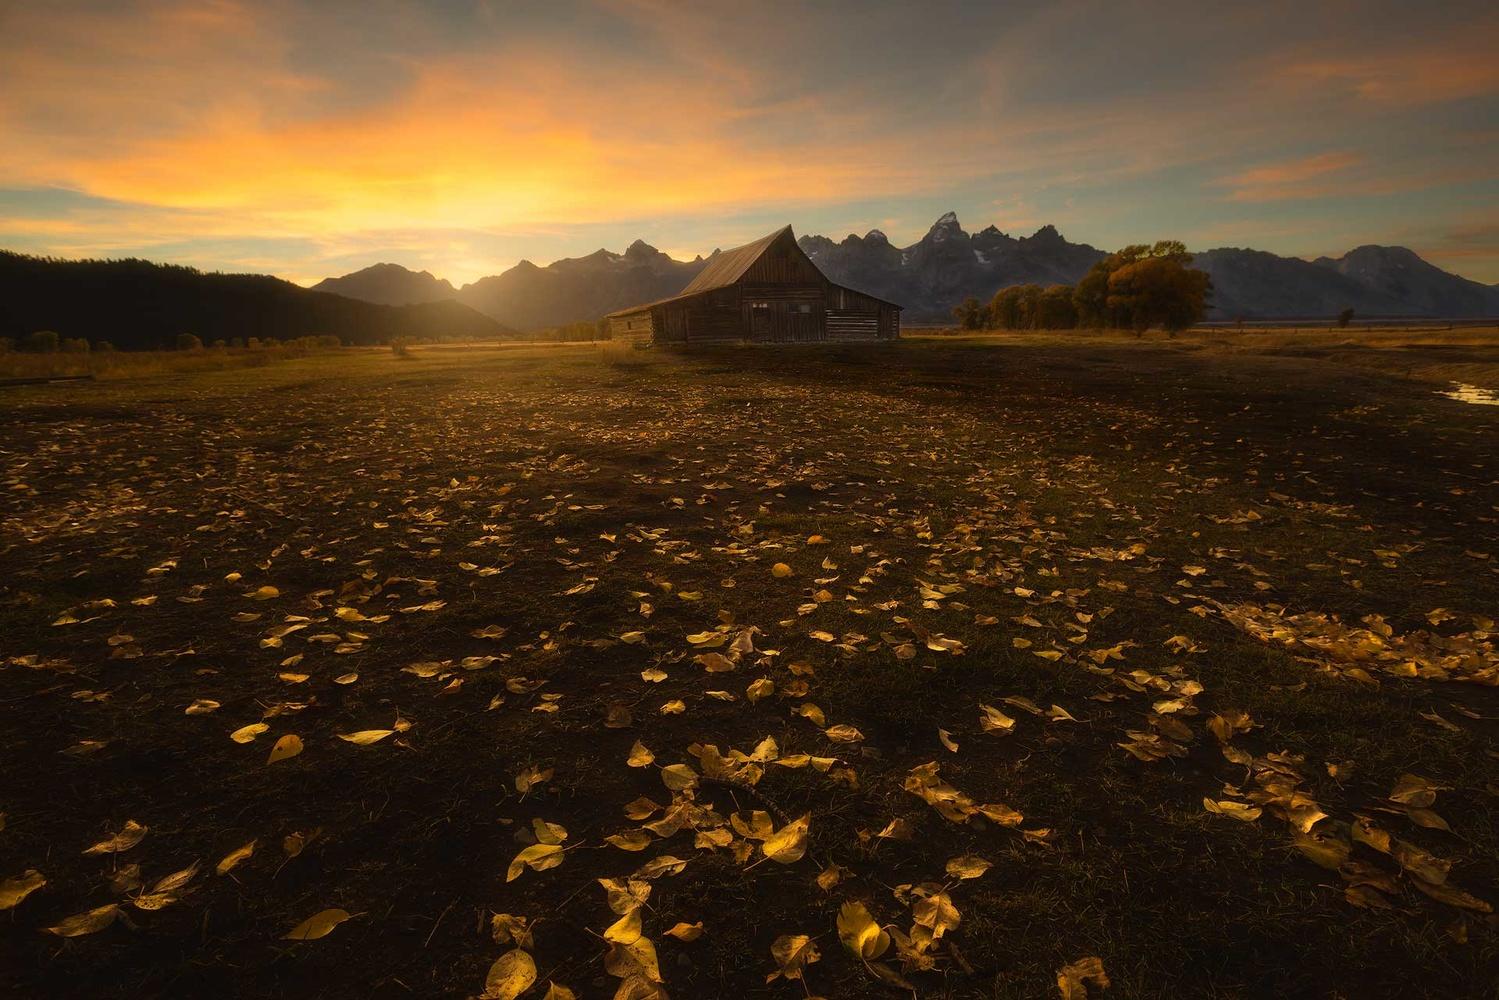 The golden Barn by Mario Suclla